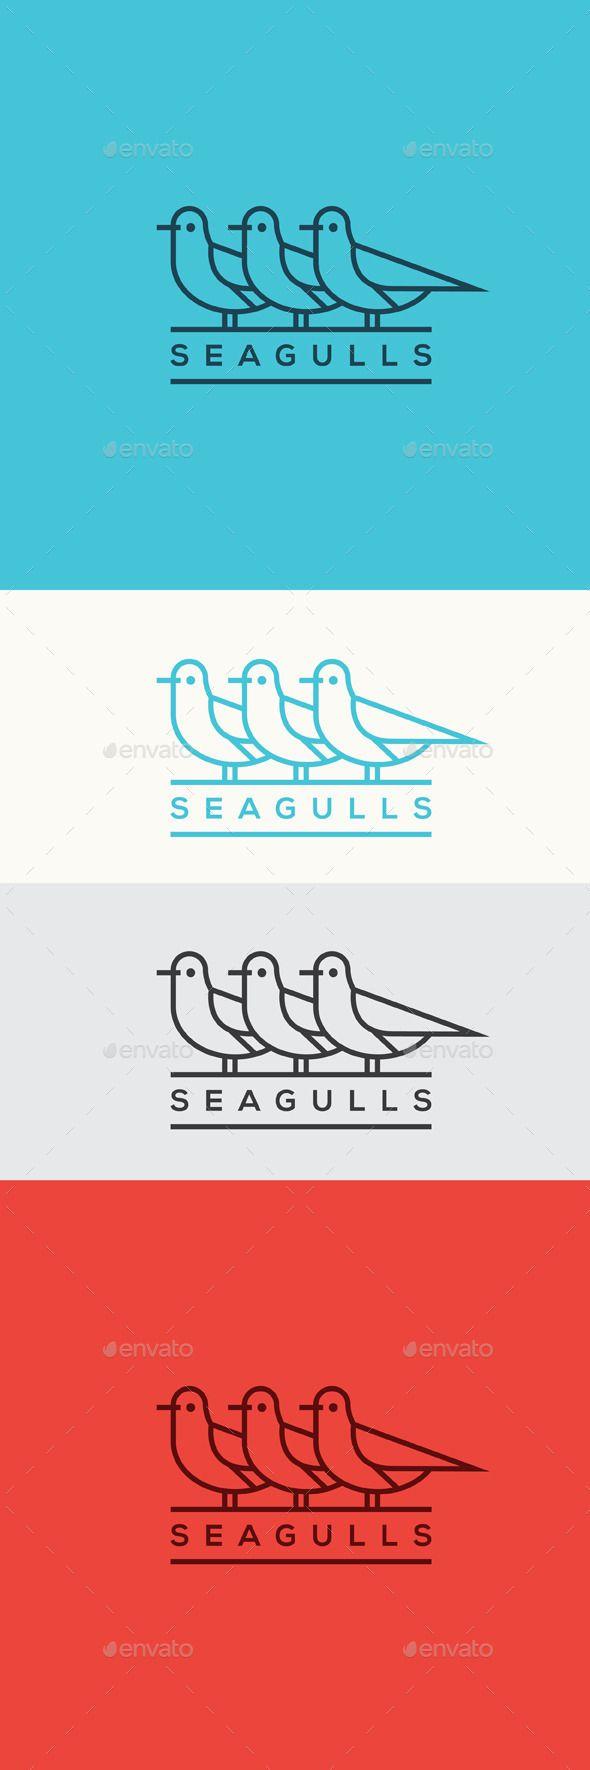 Seagulls Logo Template Vector EPS, AI #logotype Download: http://graphicriver.net/item/seagulls/11459425?ref=ksioks